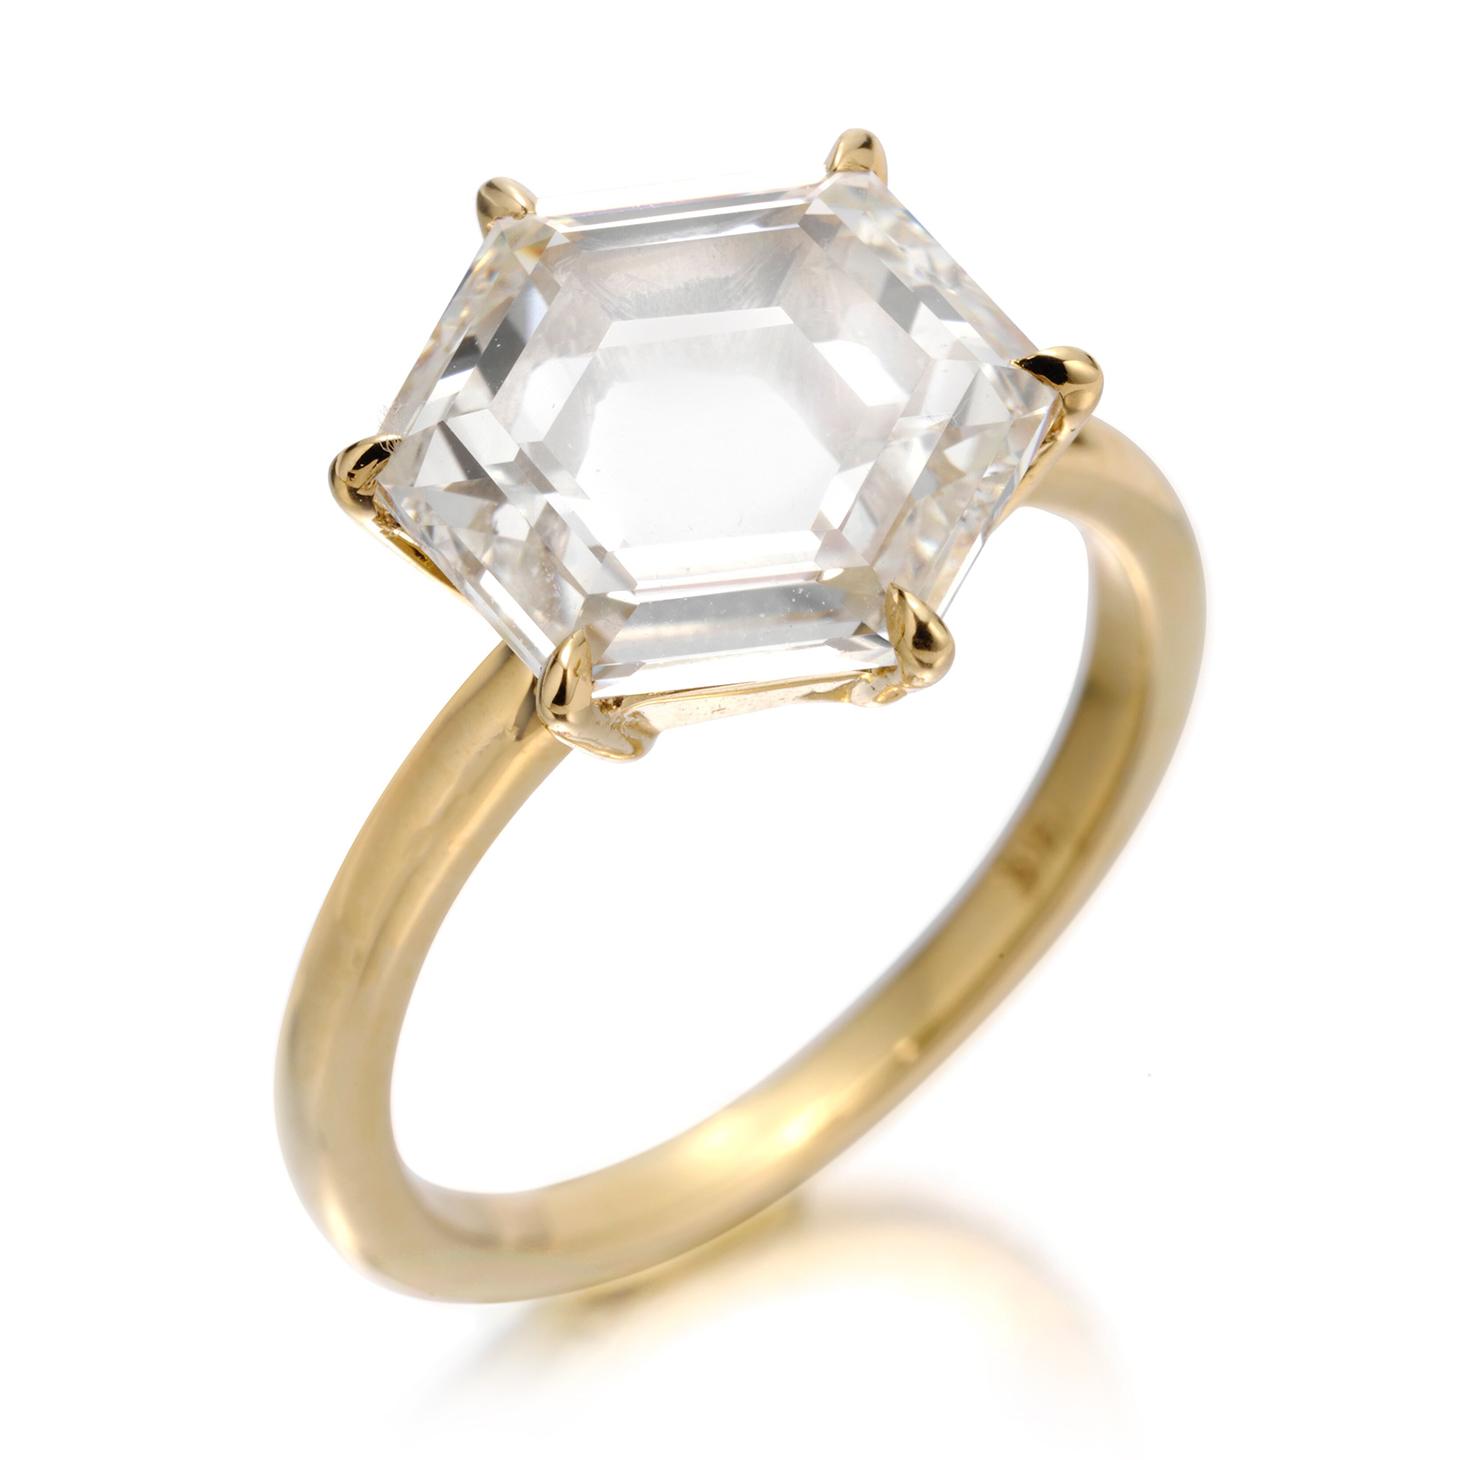 A Hexagonal-cut Diamond Ring, weighing 3.51 carats